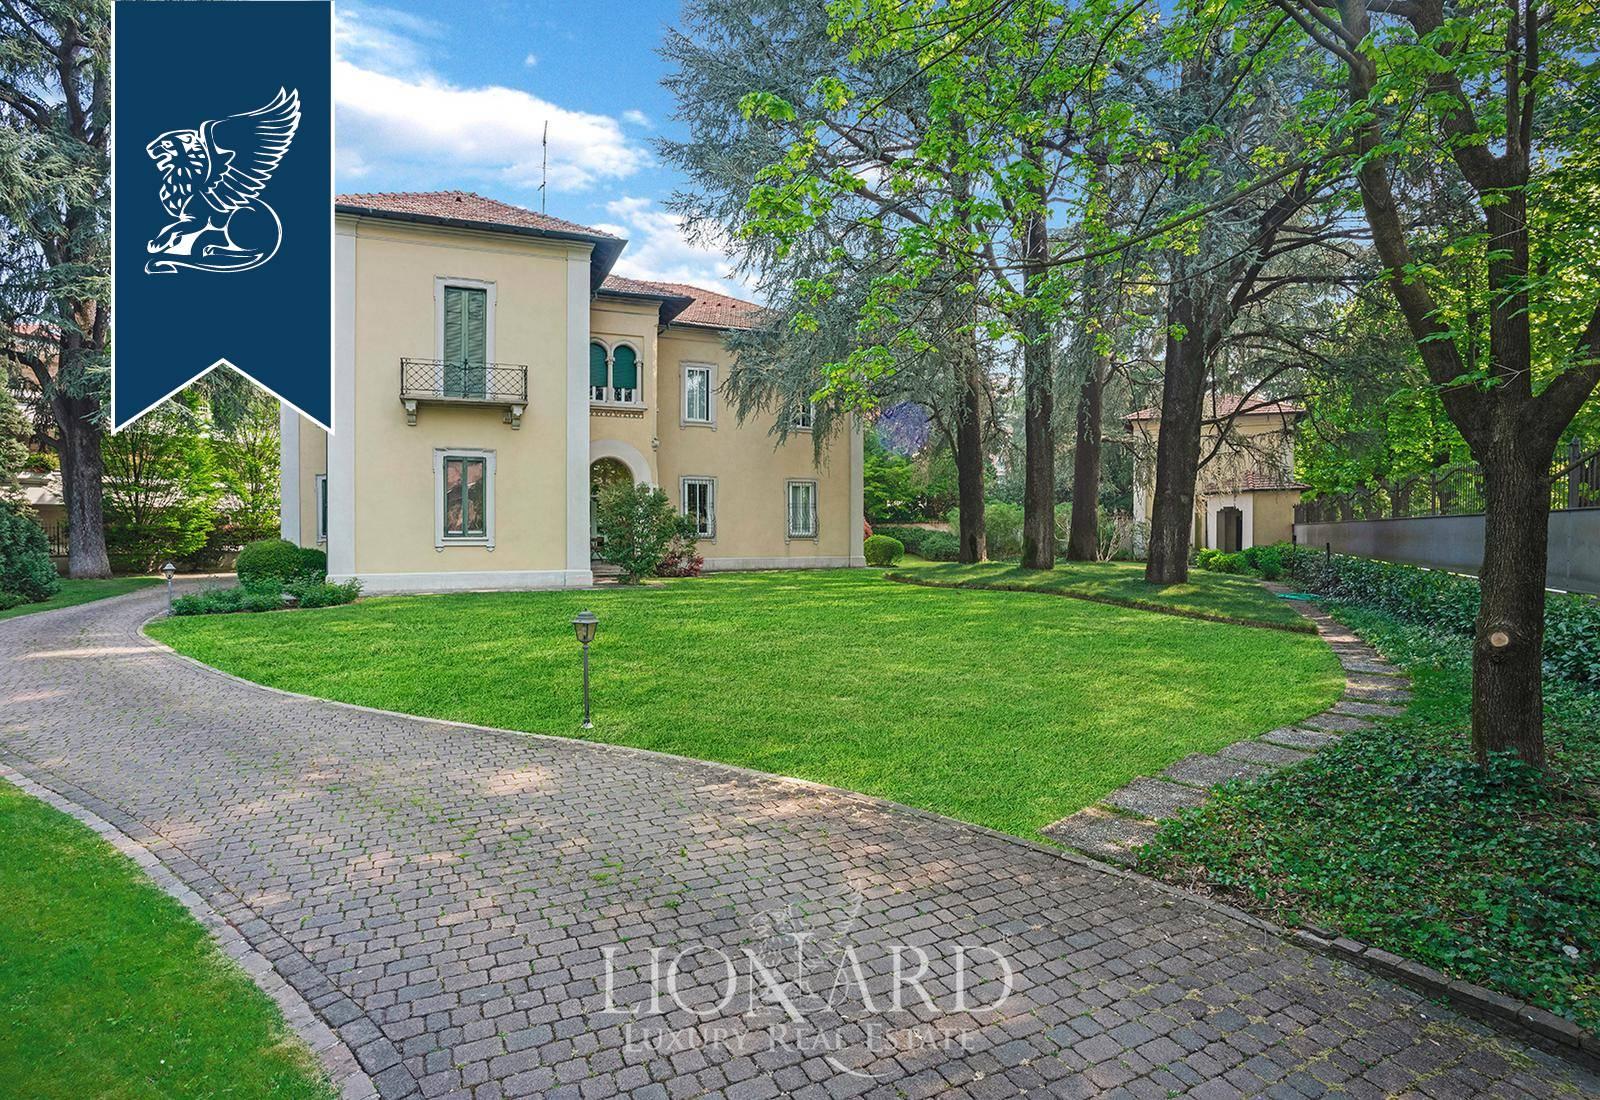 Villa in Vendita a Vimercate: 0 locali, 976 mq - Foto 6